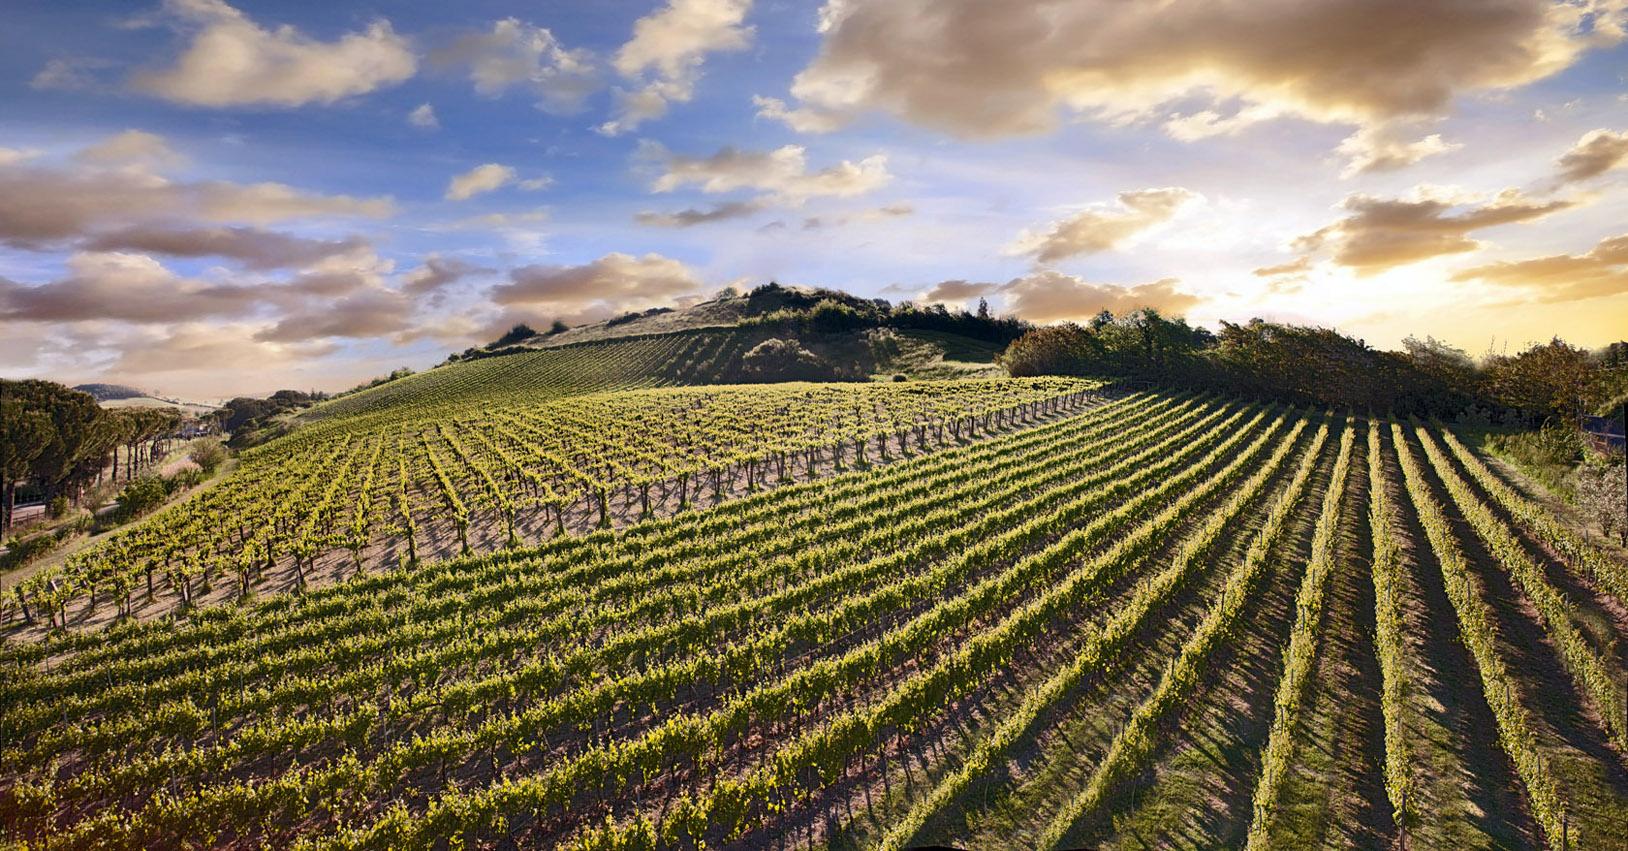 agroalimentare in italia